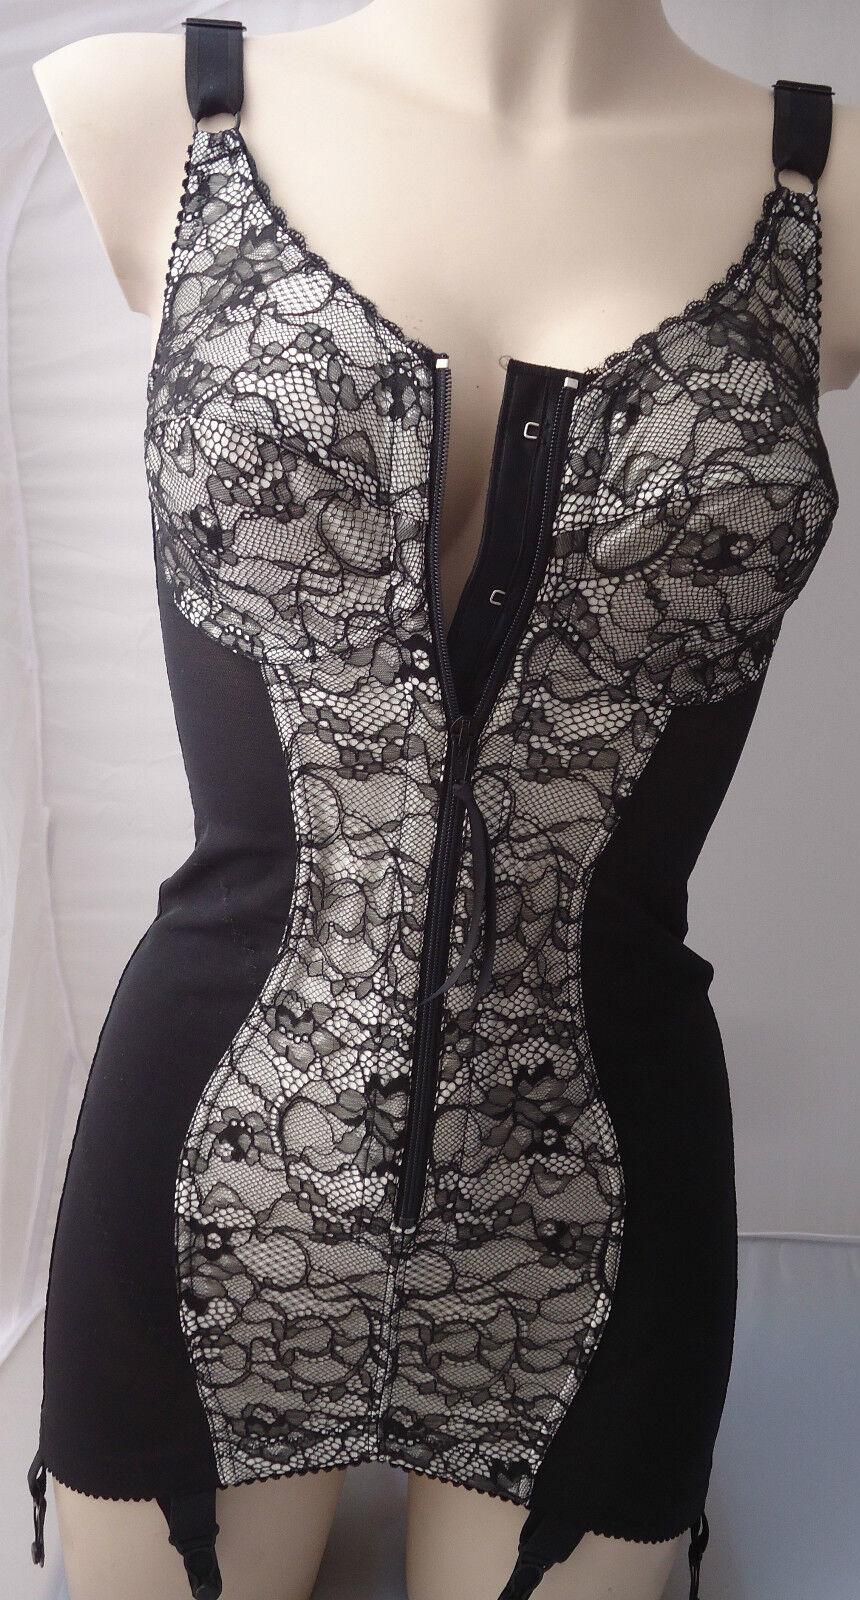 miss mary of sweden 0352 gr 75 110 b f 6x straps korselett mieder rei verschlu. Black Bedroom Furniture Sets. Home Design Ideas